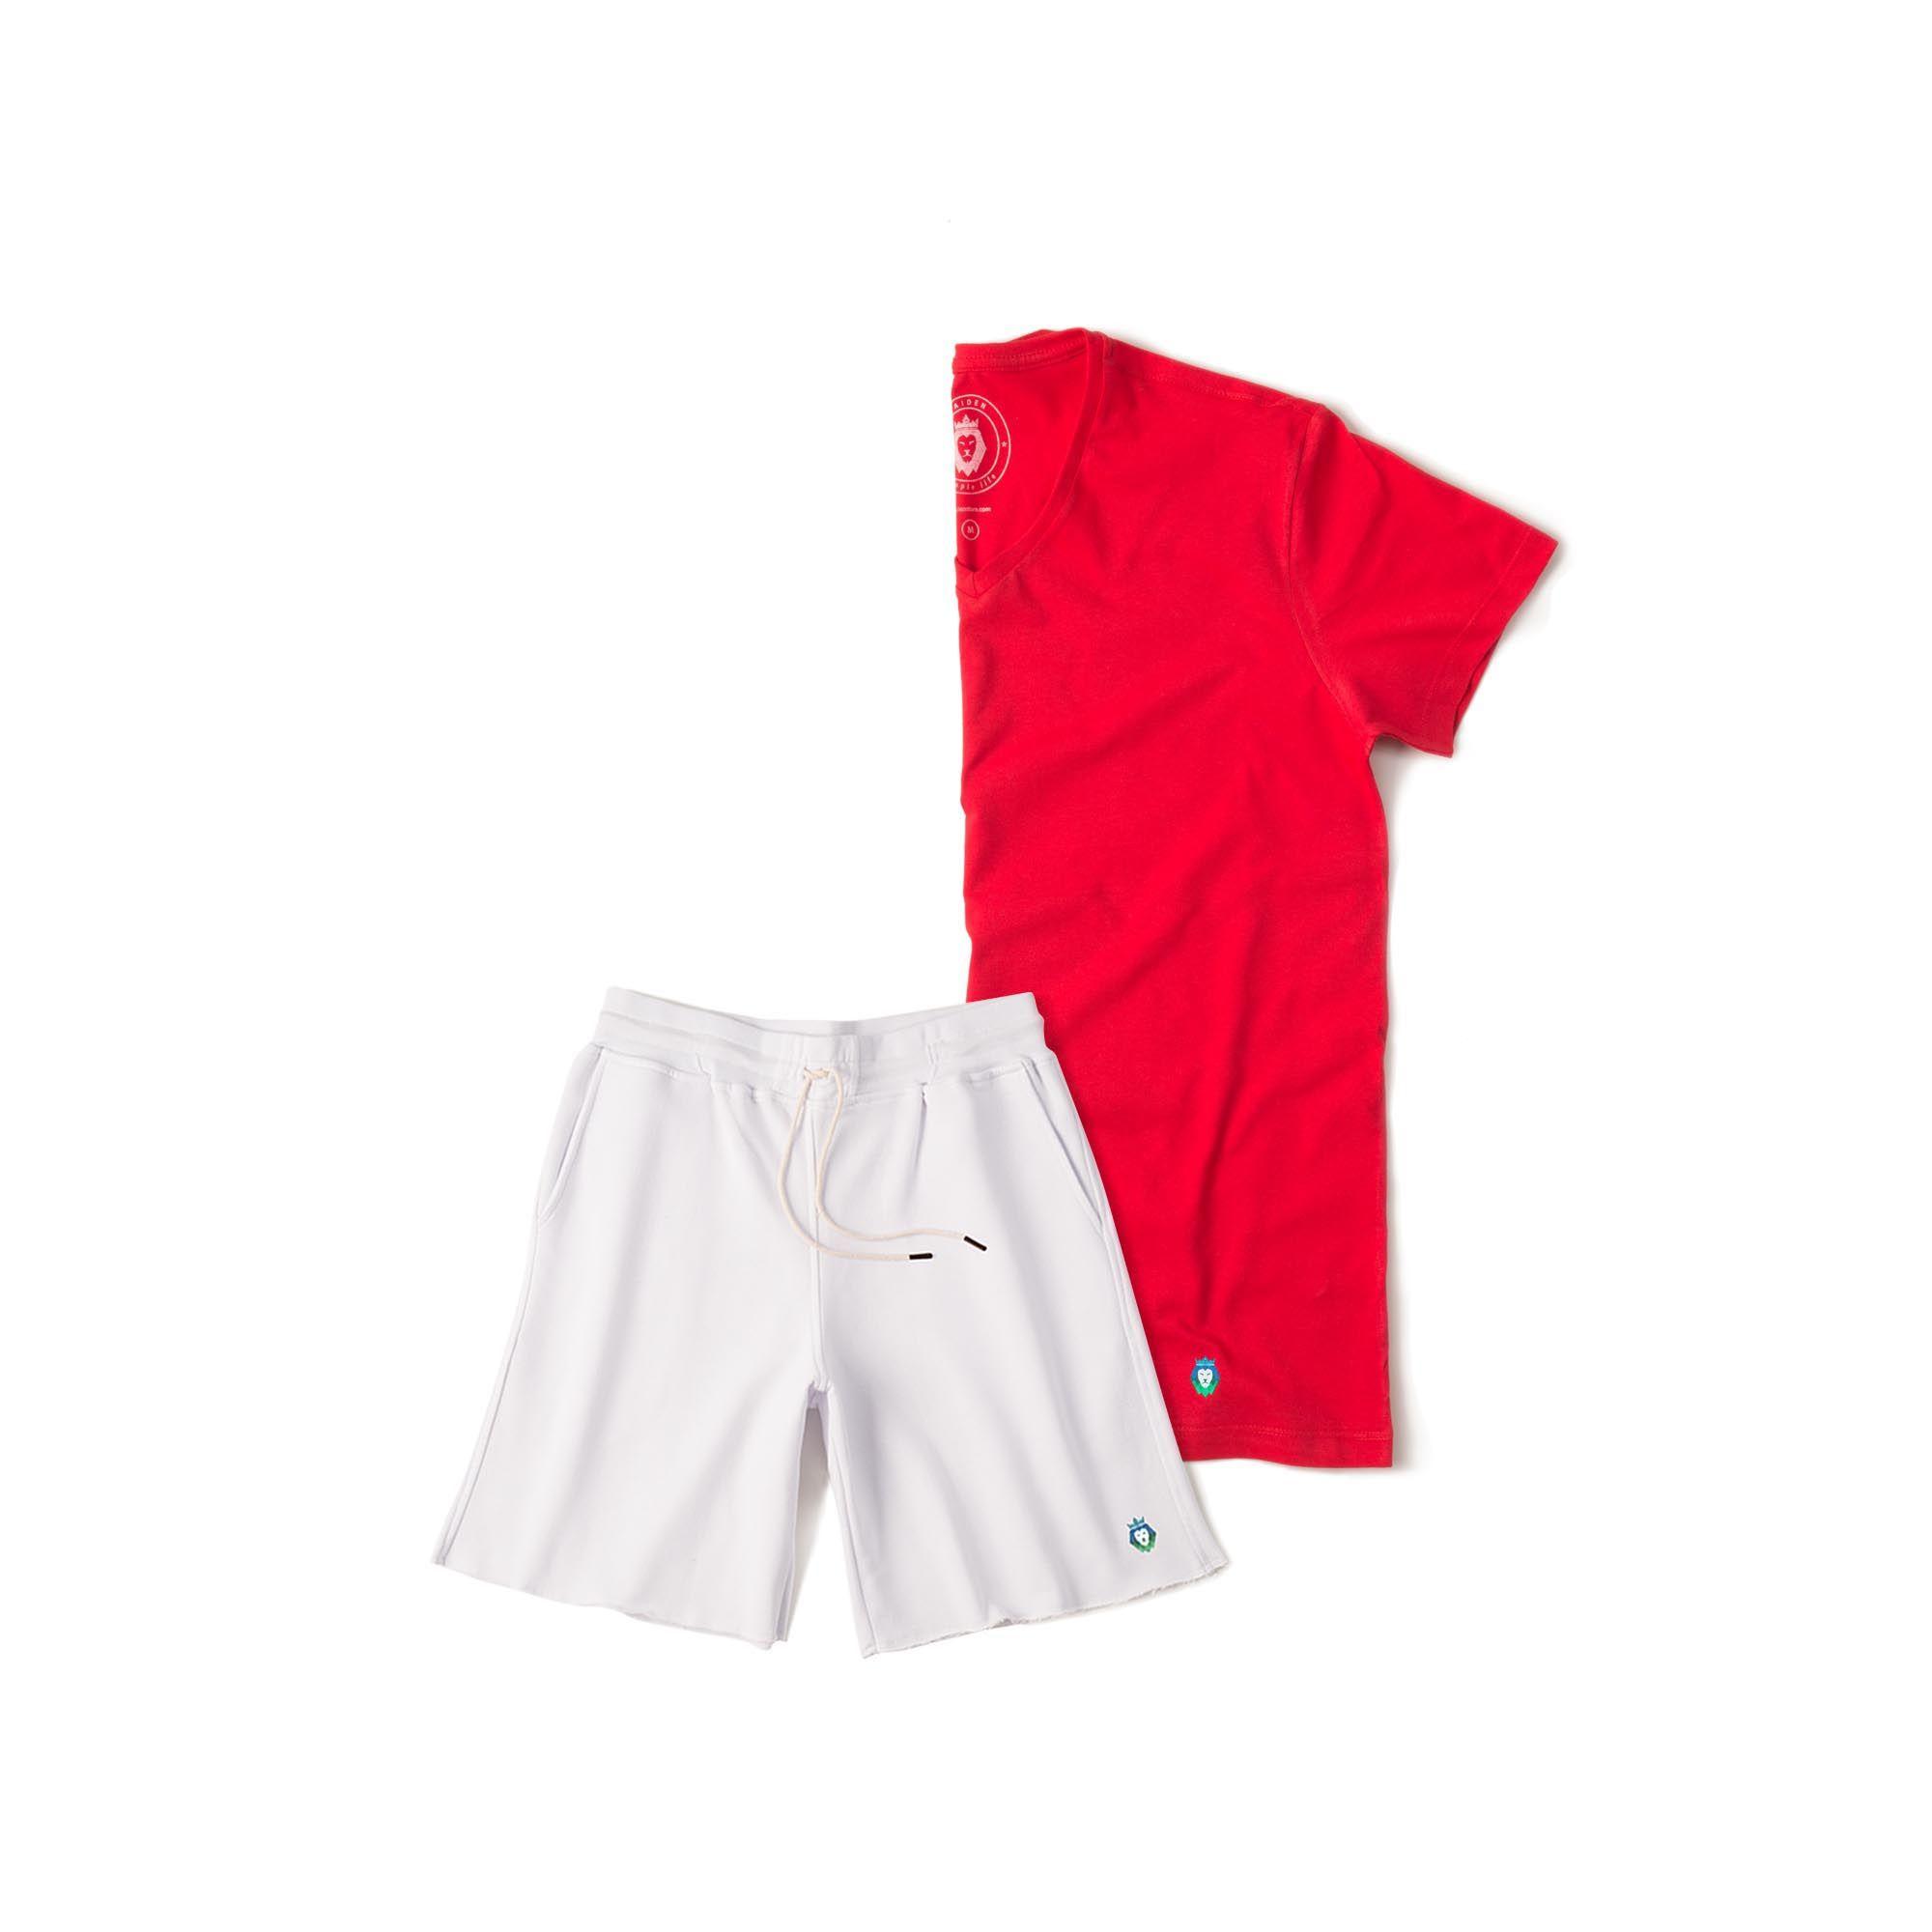 Kit 1 Bermuda Basic Branca + 1 T-Shirt Basic Vermelha Zaiden Masculina